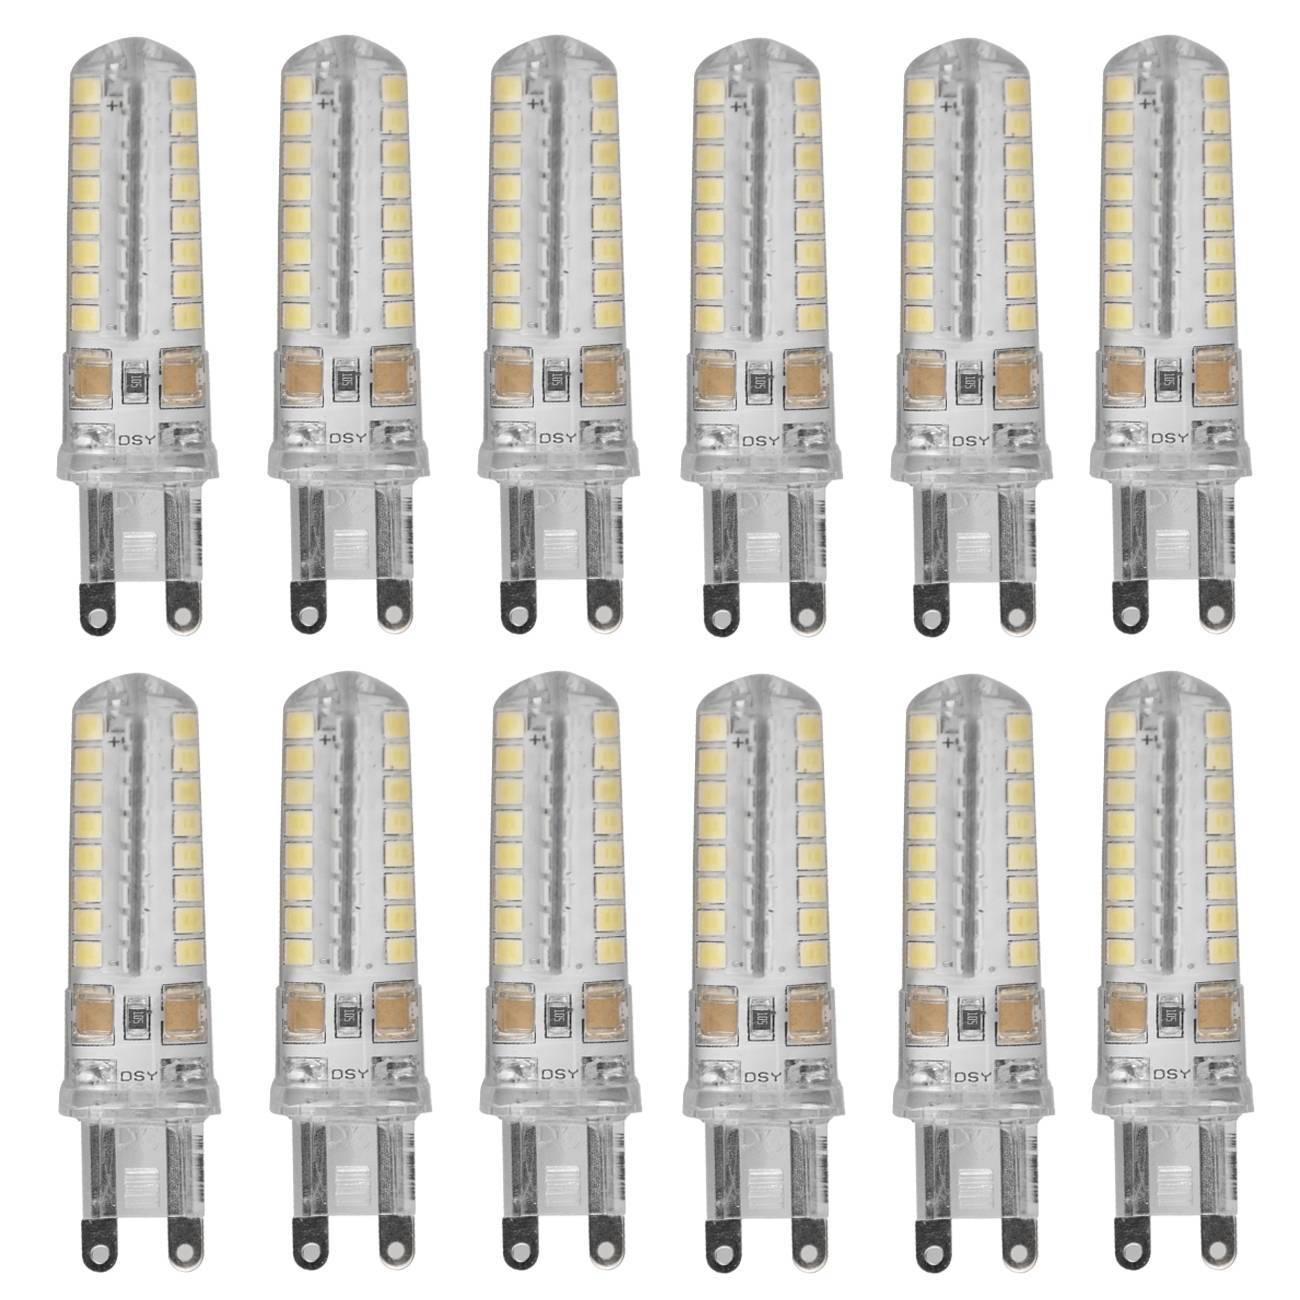 Kit 10 Lâmpadas Led Halopin G9 5w Branco Frio P/ Lustres e P - LCGELETRO